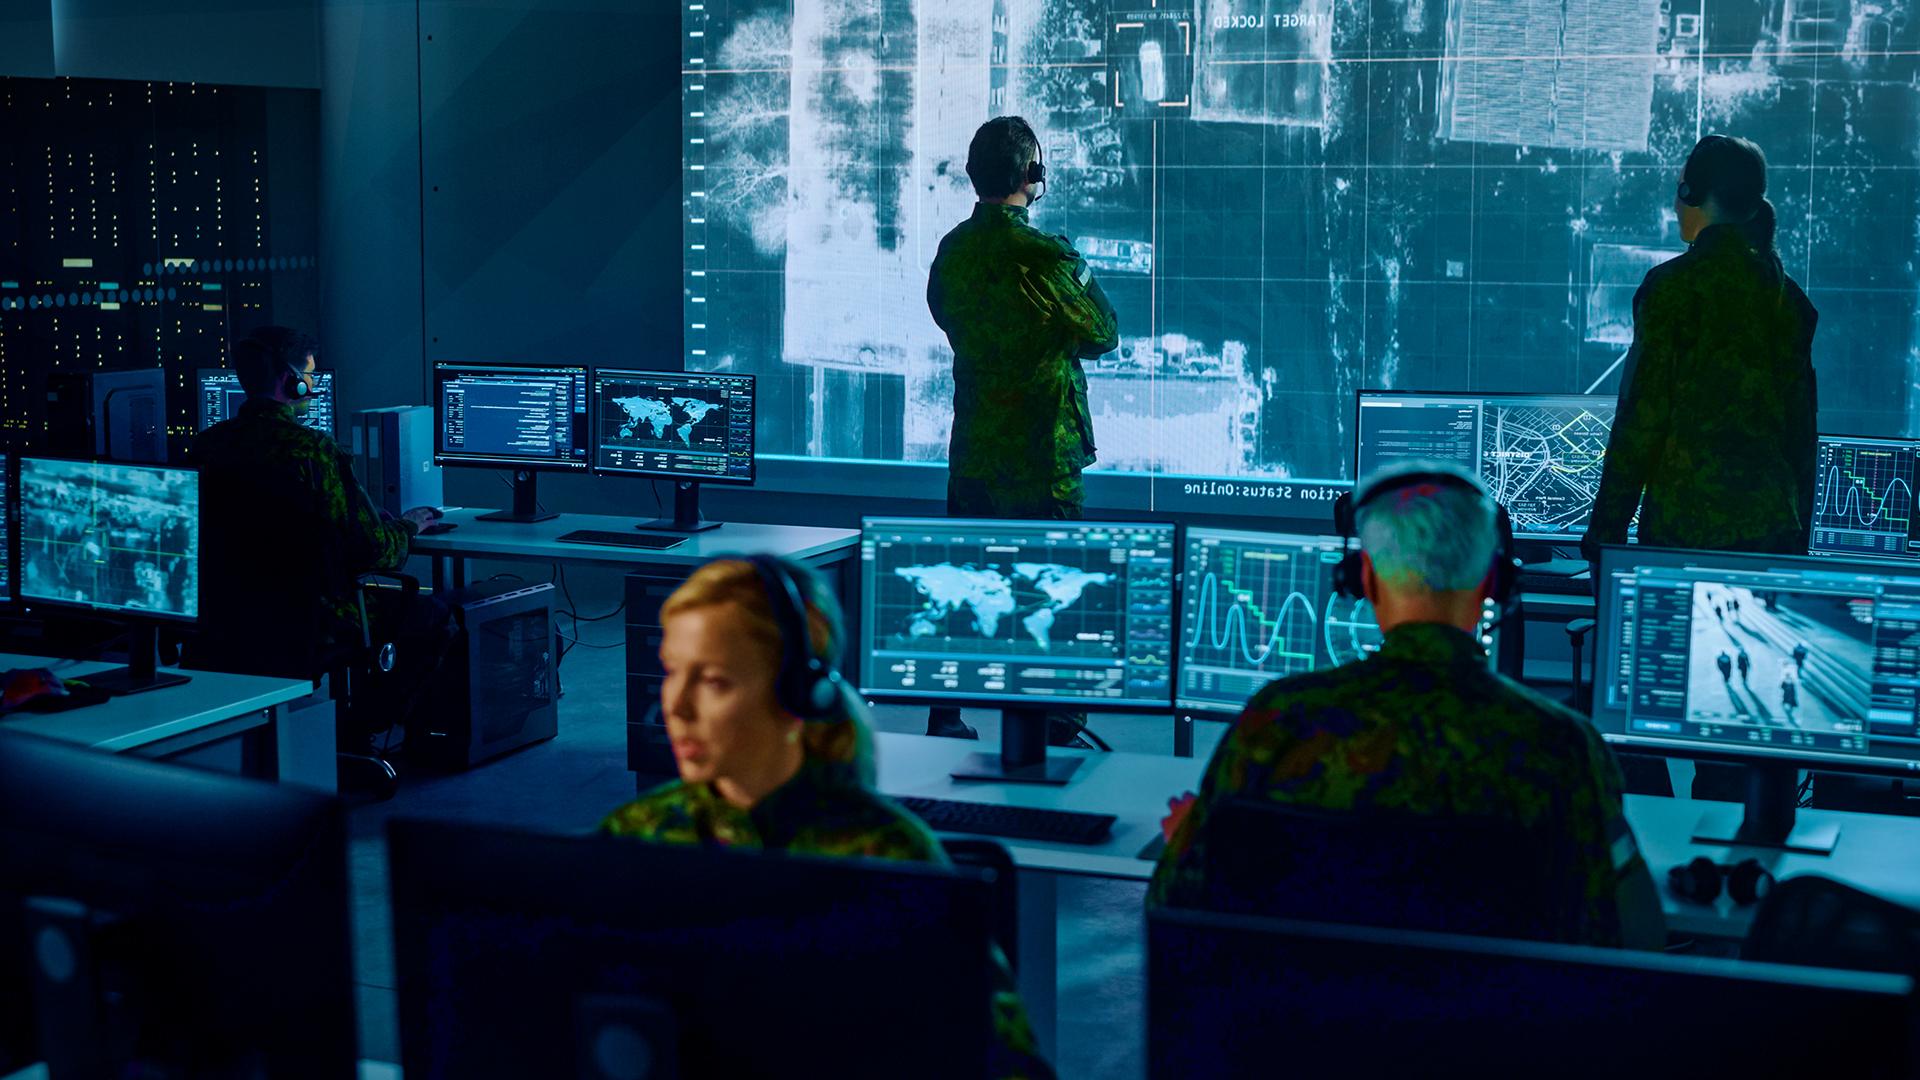 überwachung, Spionage, Cybercrime, Cybersecurity, Hackerangriff, Darknet, Militär, Hacker Angriffe, Krieg, Cyberwar, Bundeswehr, Soldaten, Armee, US Army, Soldat, Us Armee, War, Flecktarn, Aufklärung, Mission Control, Situation Room